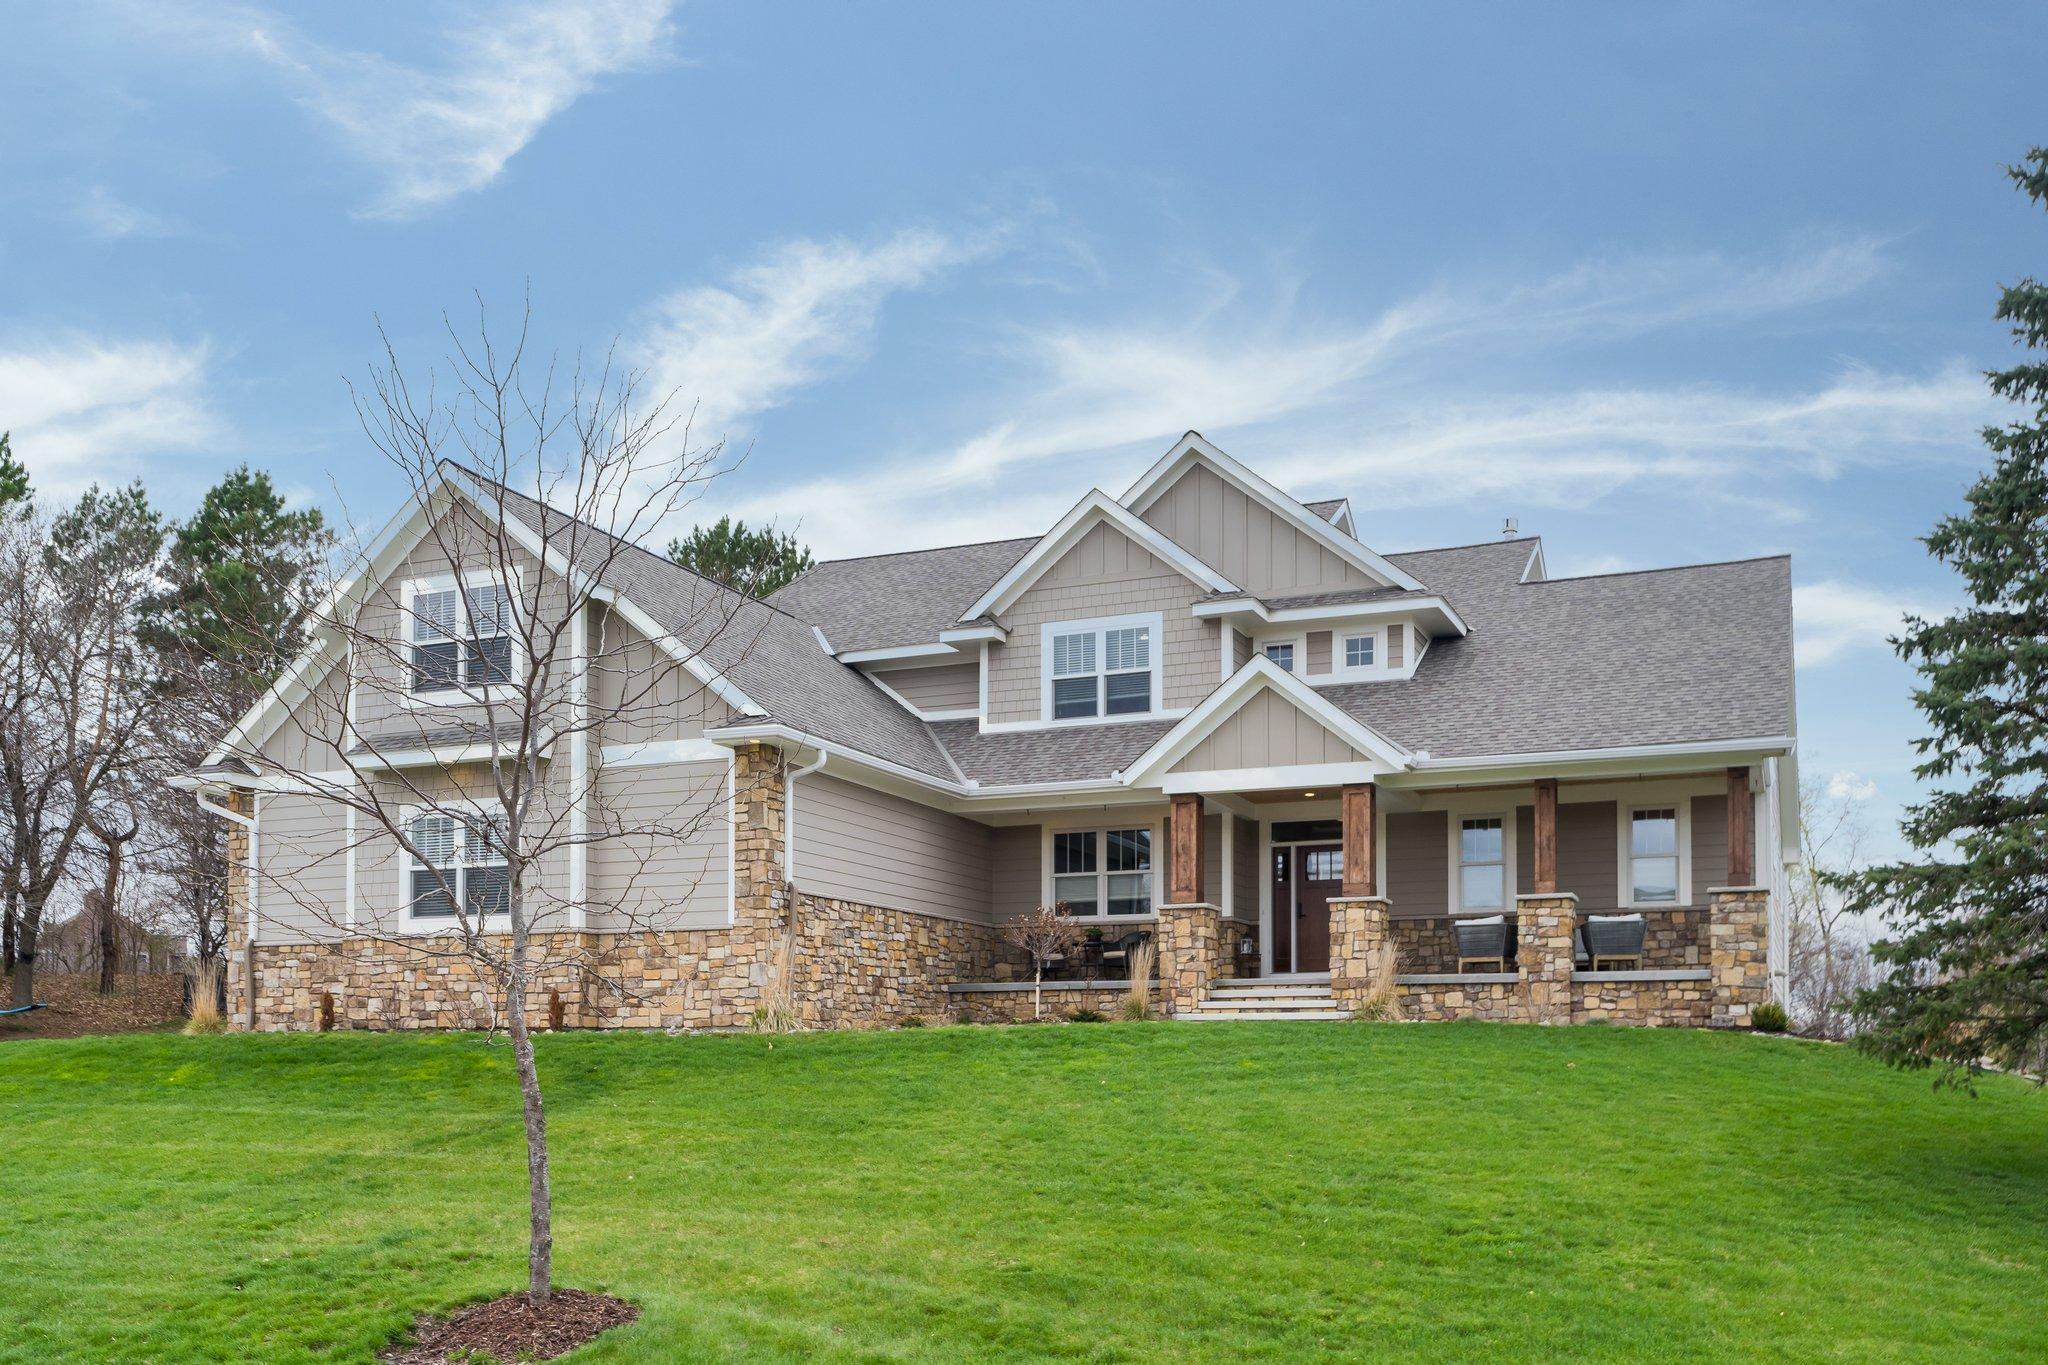 1000 Applewood Court Property Photo - Mankato, MN real estate listing